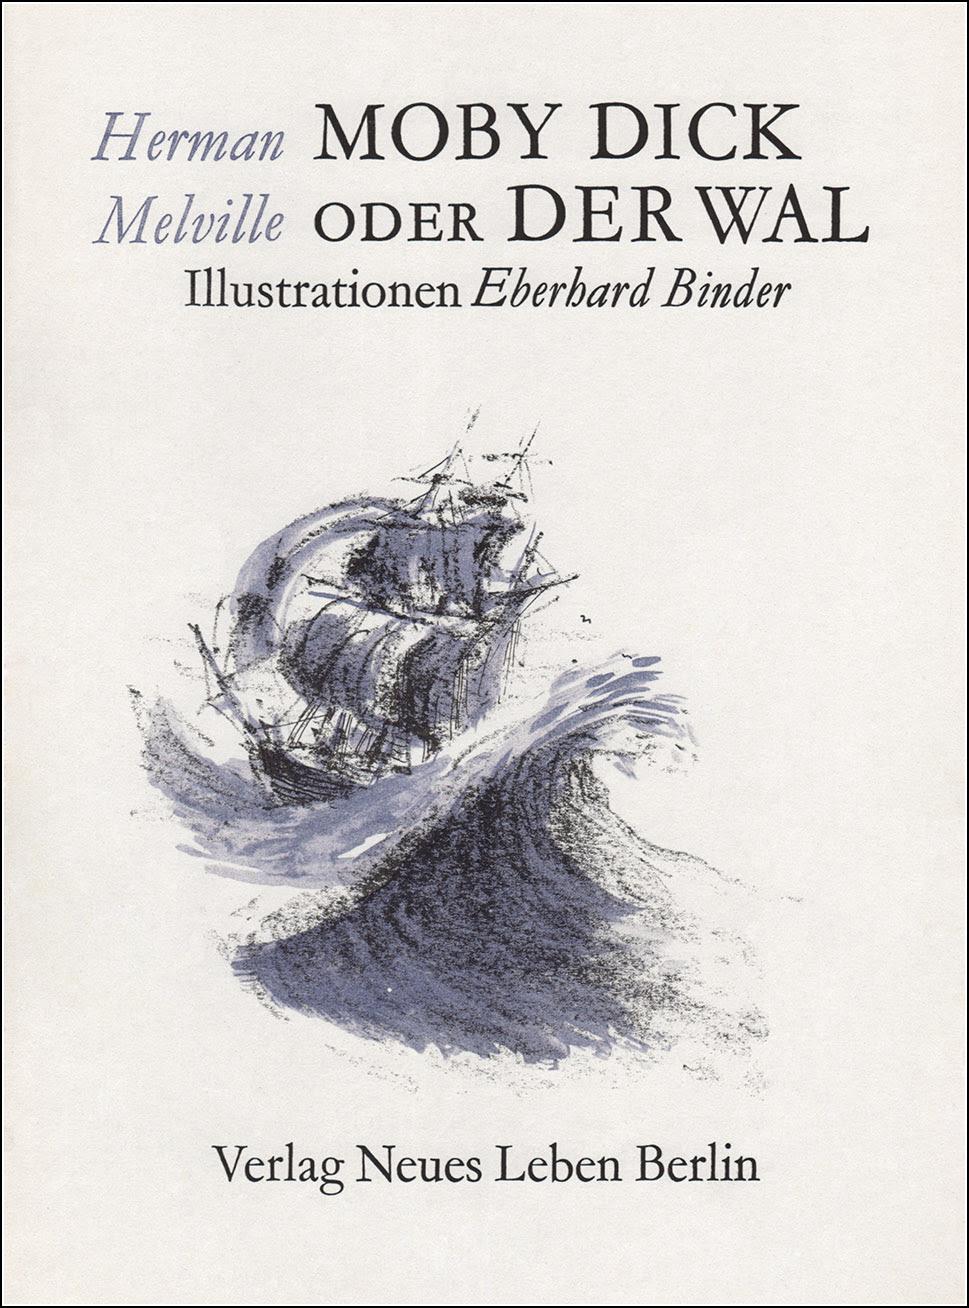 Eberhard Binder-Staßfurt, Moby Dick